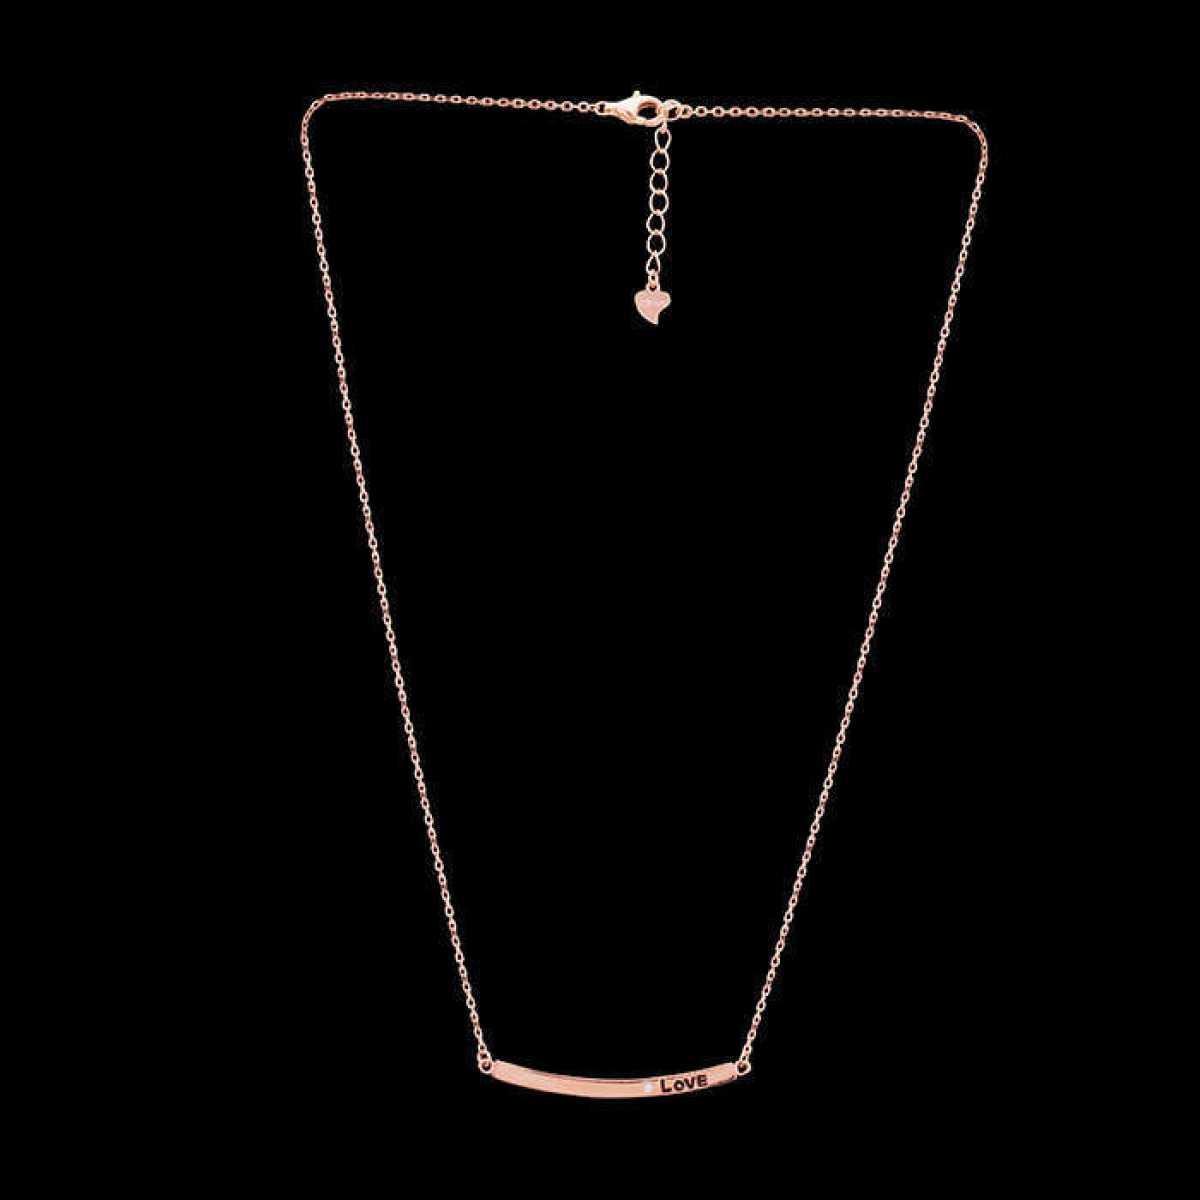 Love Single Diamond Chain